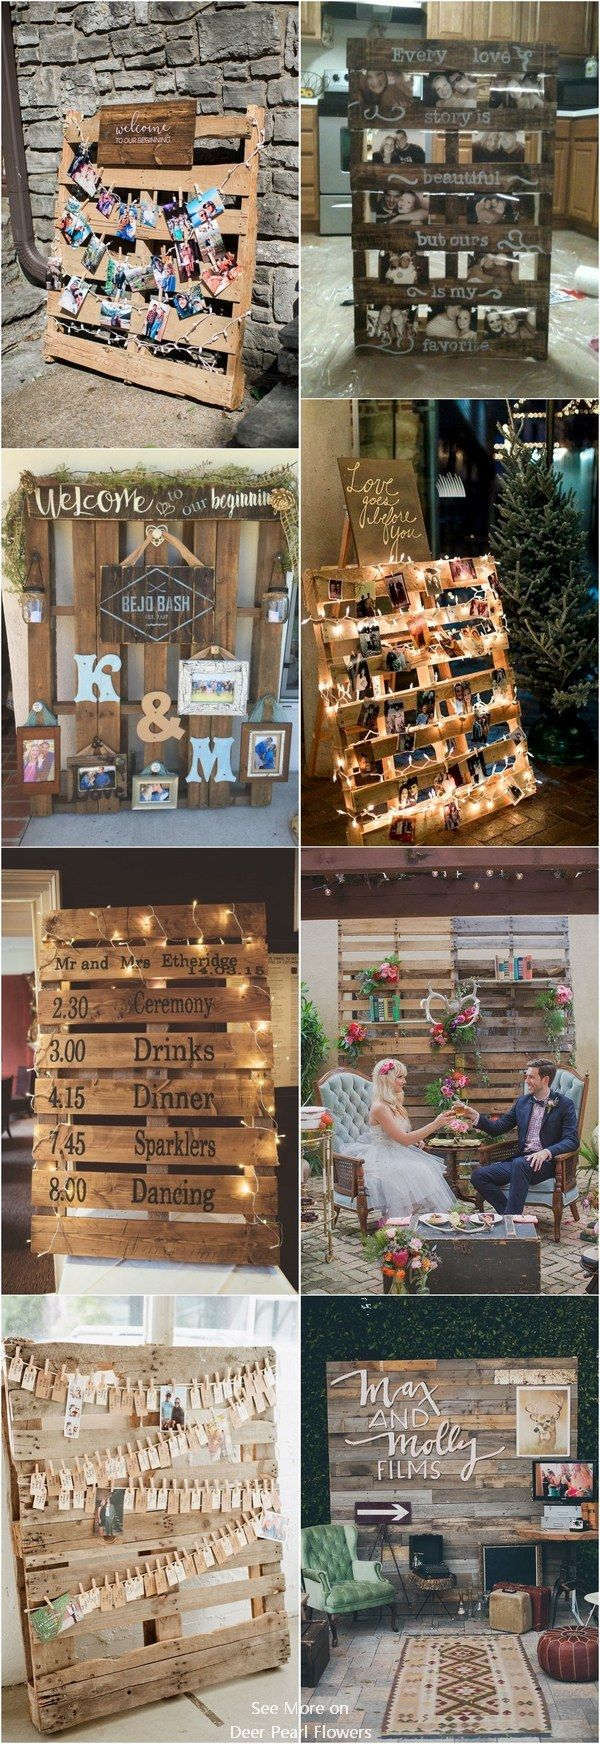 Pallet wedding decor ideas  Top  Rustic Country Wooden Pallet Wedding Ideas  Wood pallets